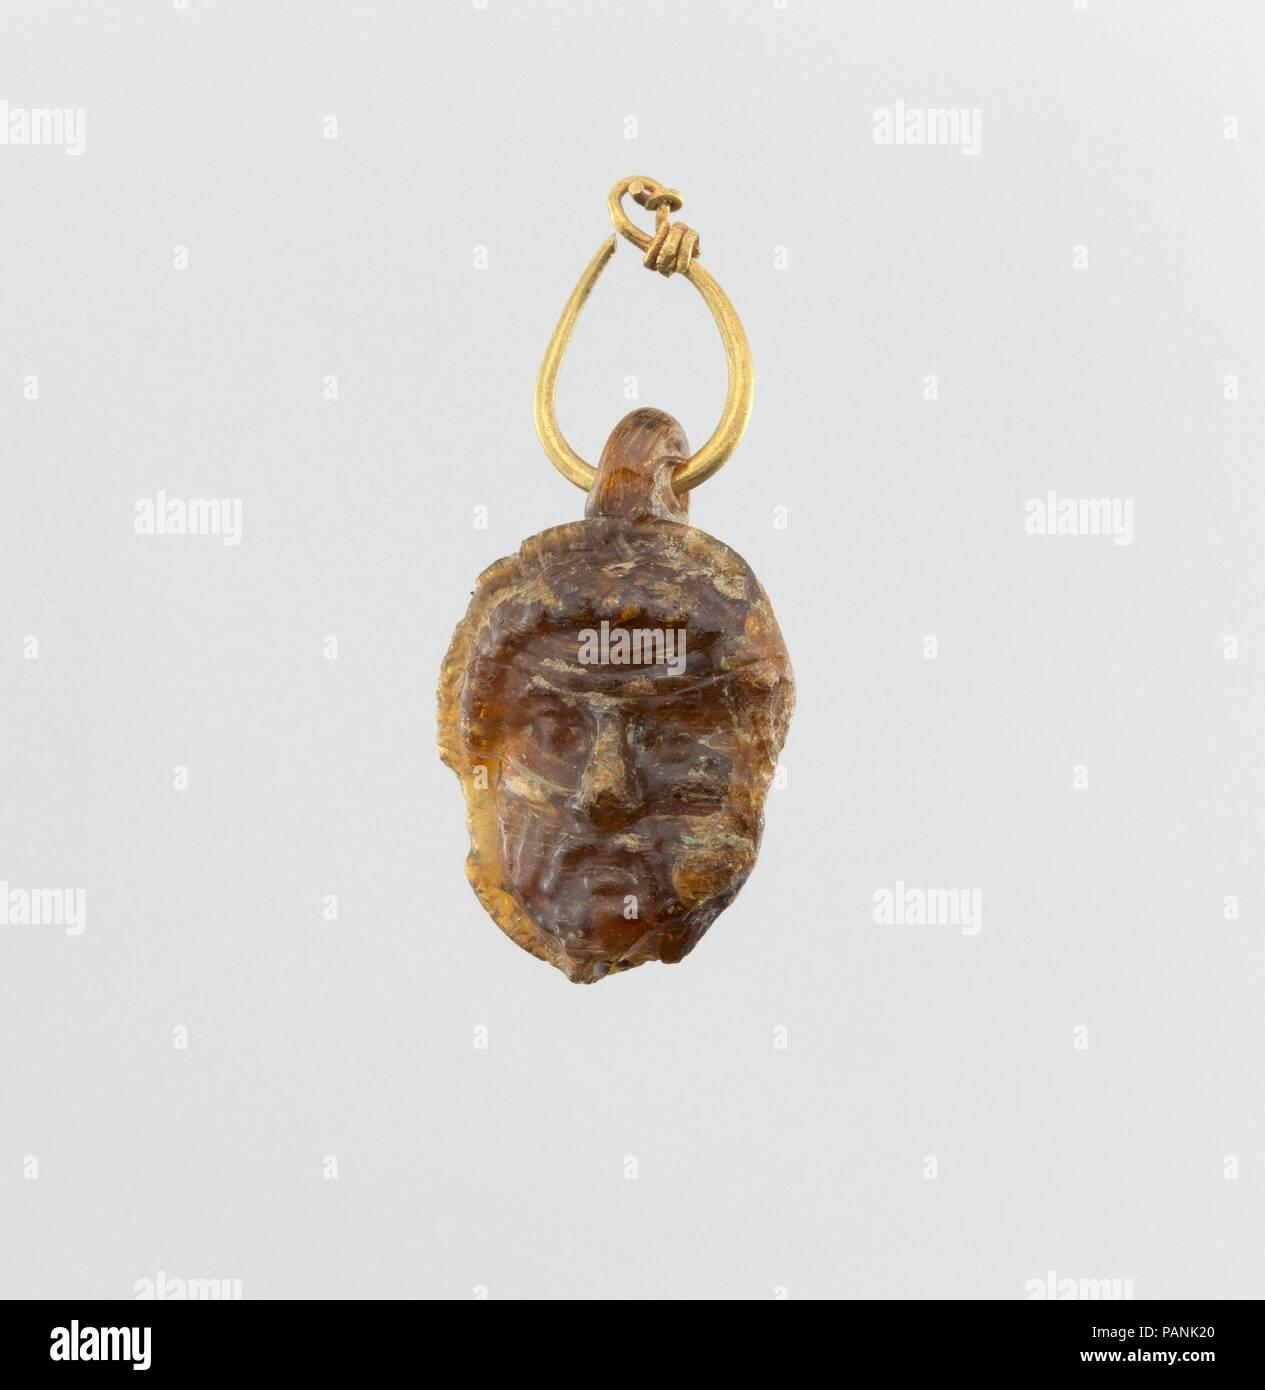 7439d0965c5a Cristal doble cabeza colgante con aro de oro. Cultura  púnico ...